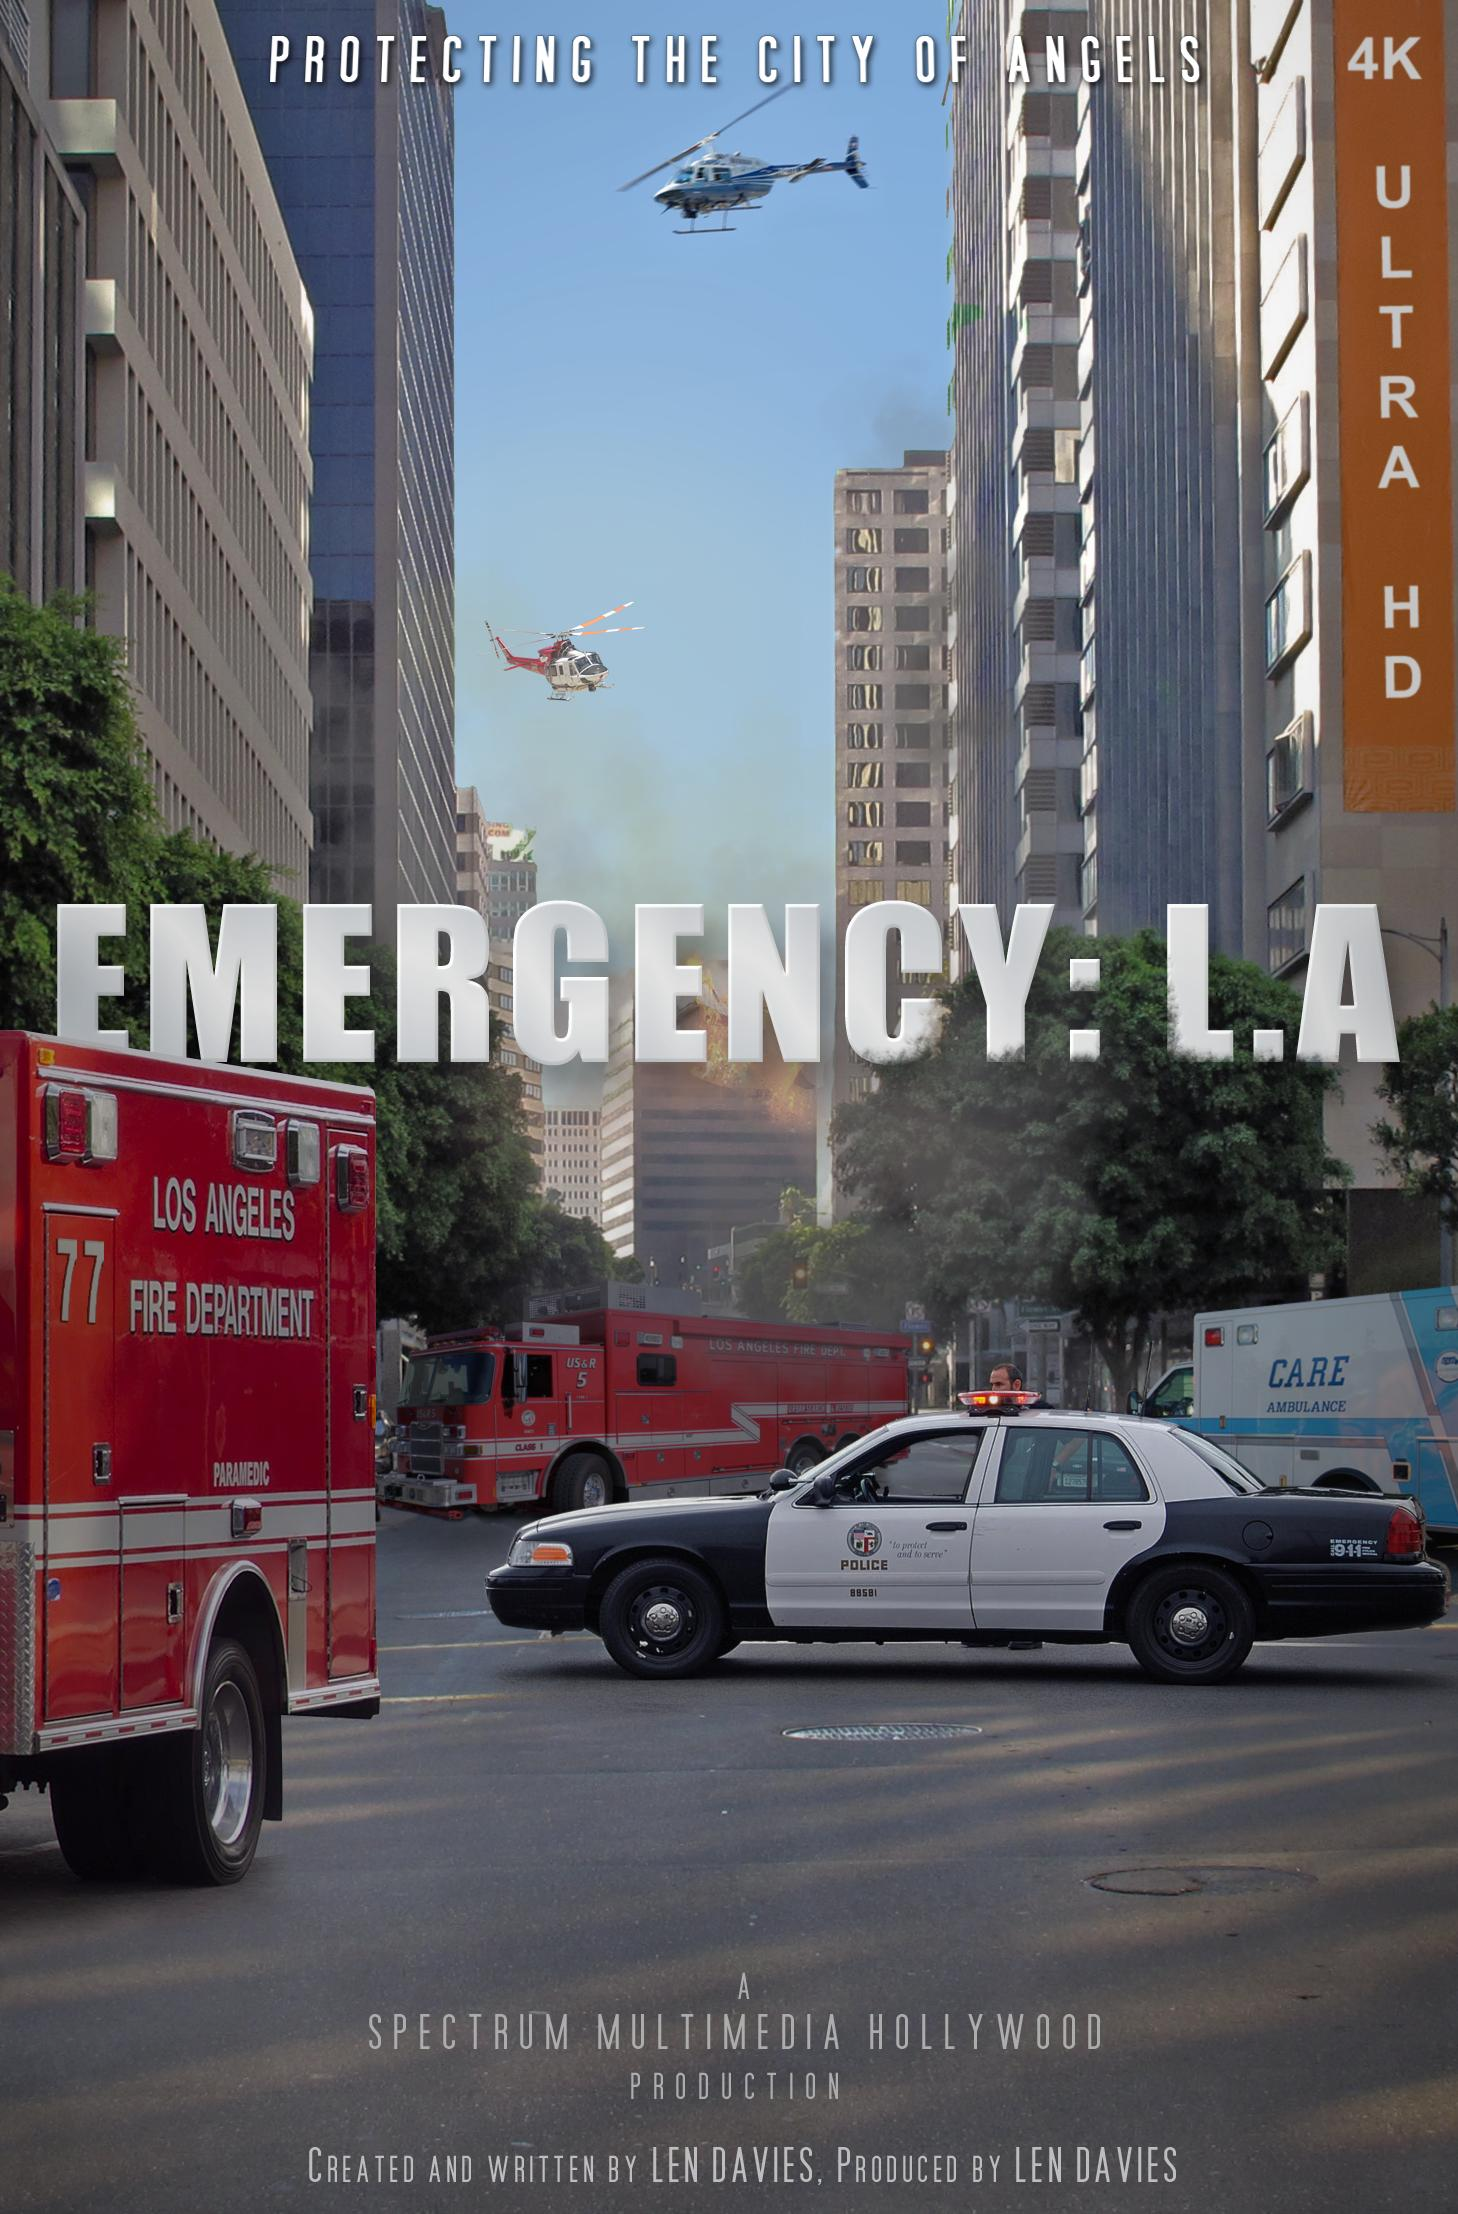 Emergency: LA (TV Series 2019– ) - IMDb